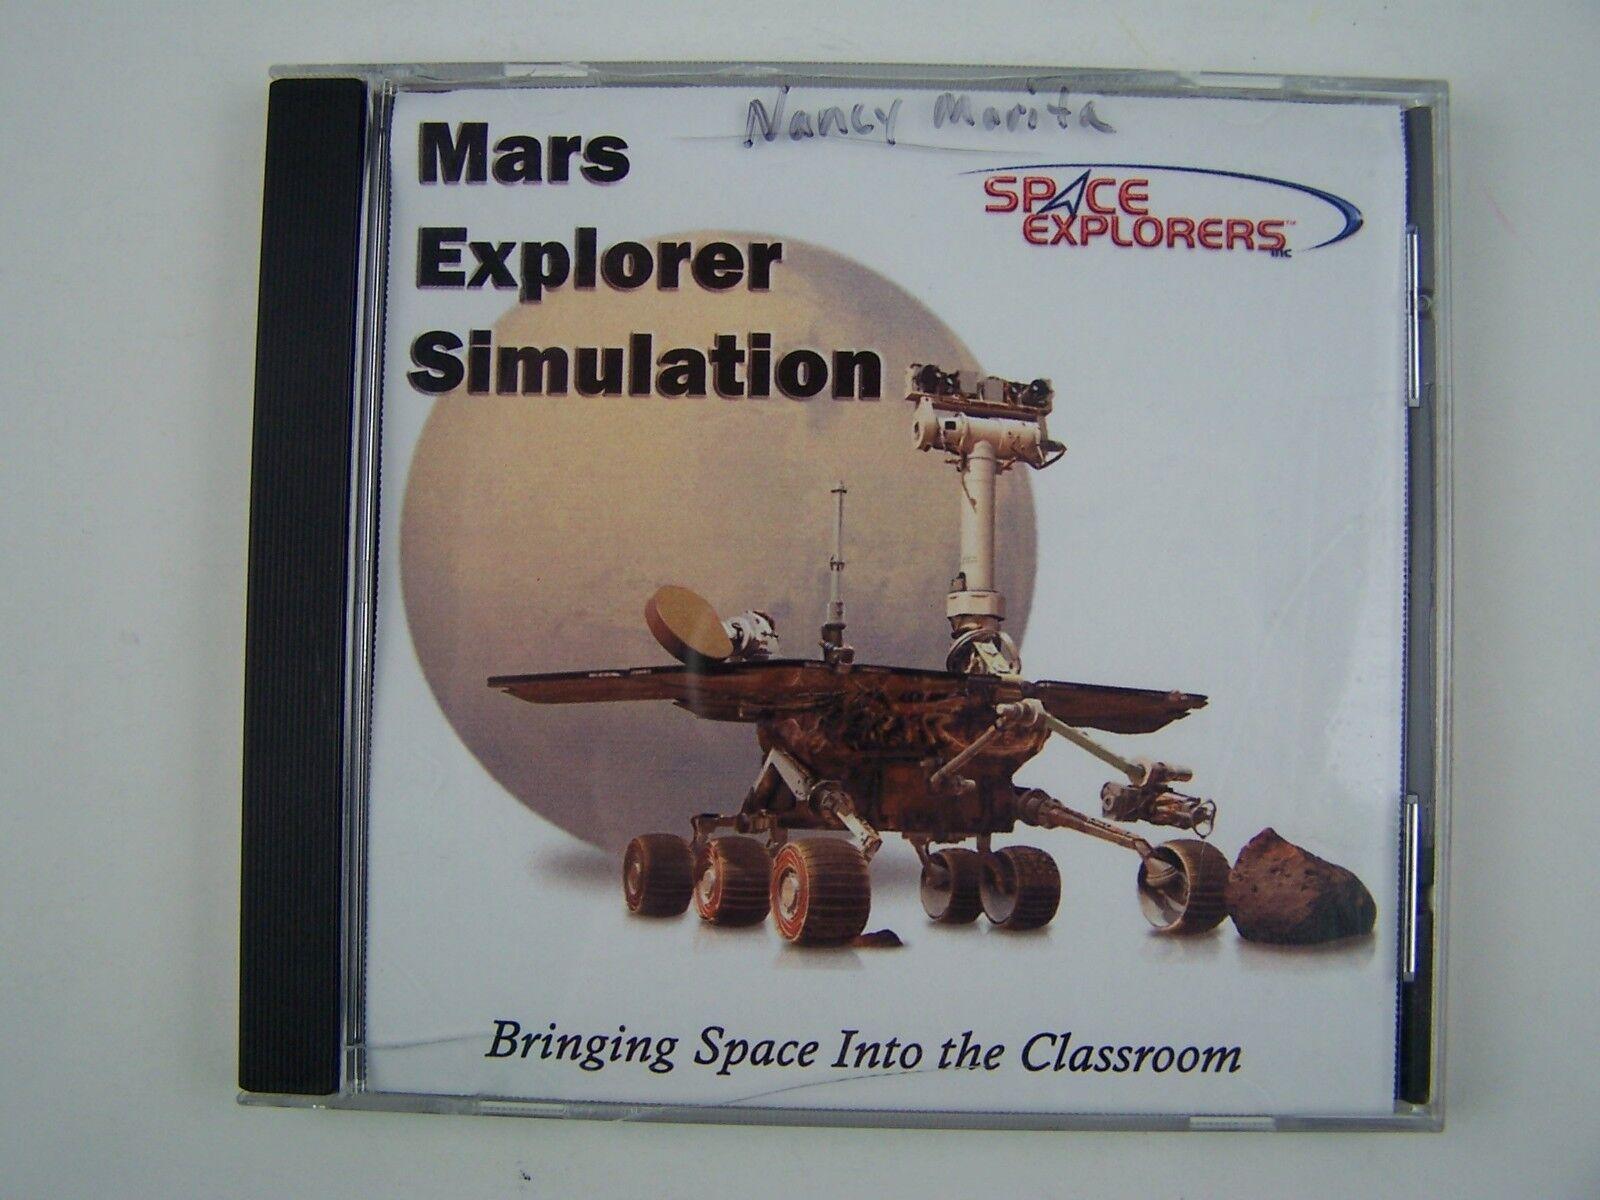 Space Explorers Mars Explorer Simulation PC CD-ROM